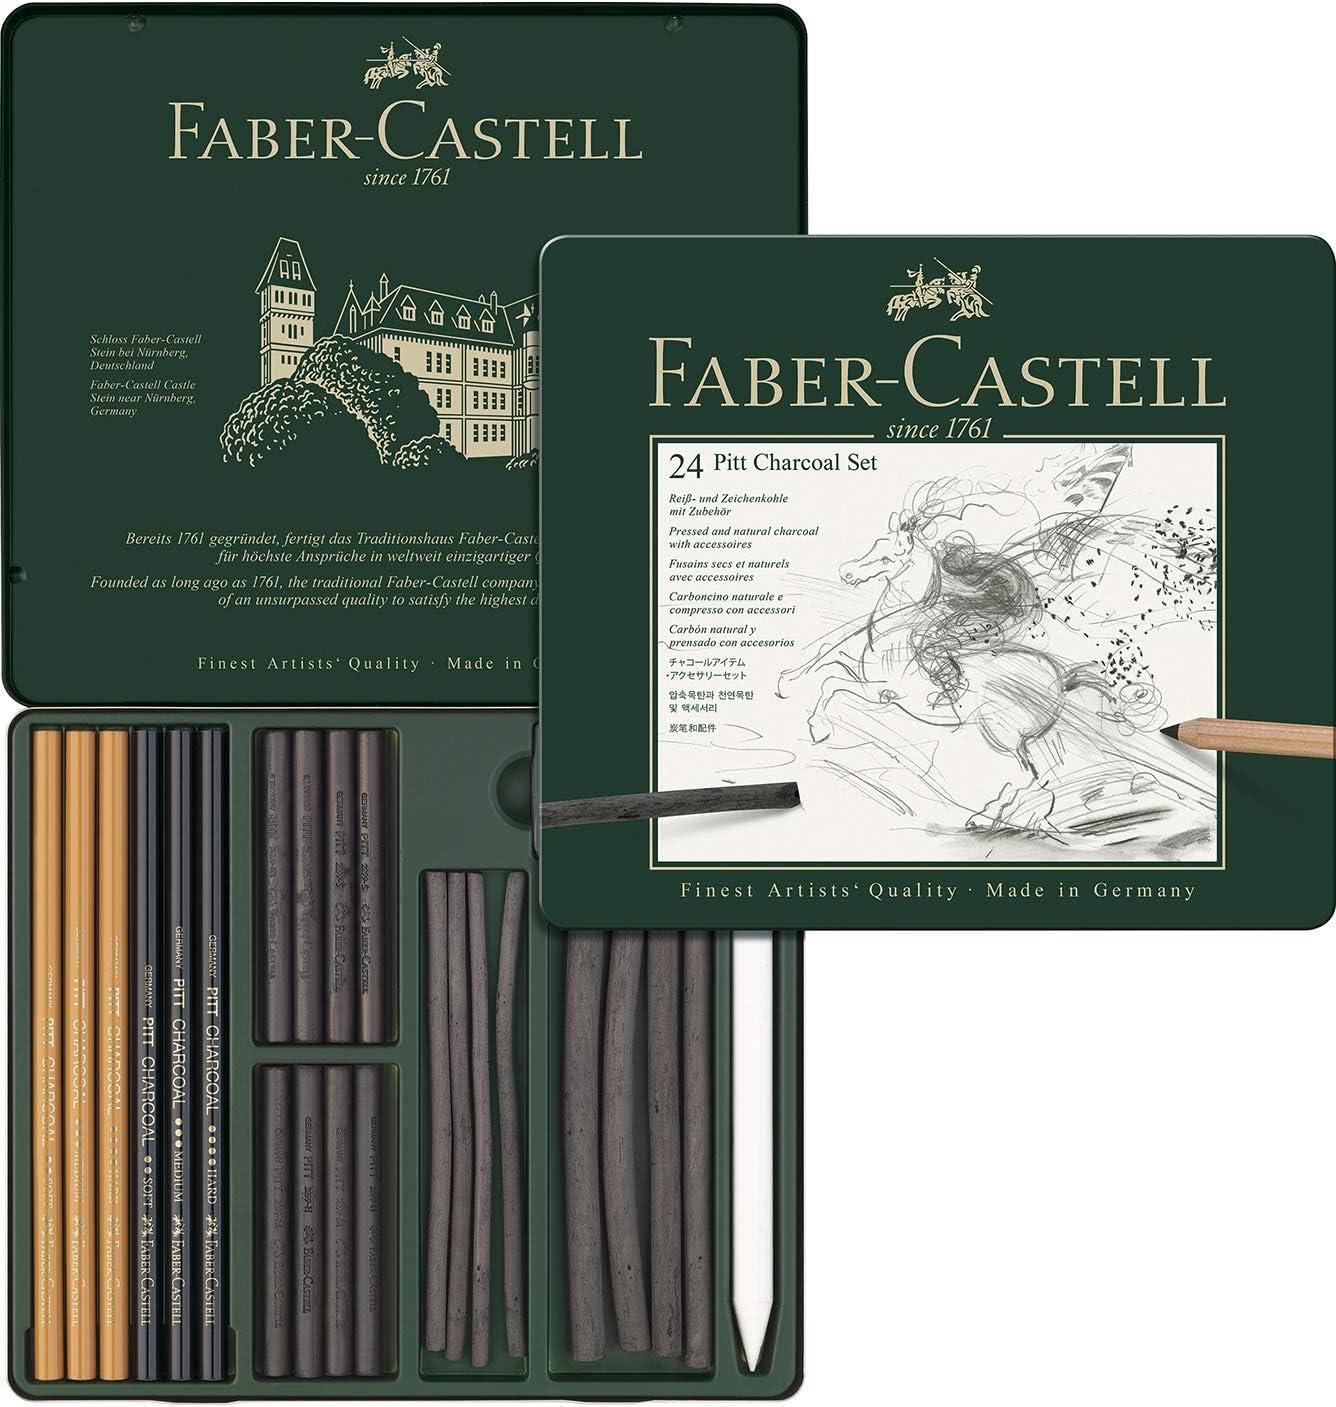 Faber-Castell Pitt 3-6mm Natural Charcoal Sticks Pack of 20